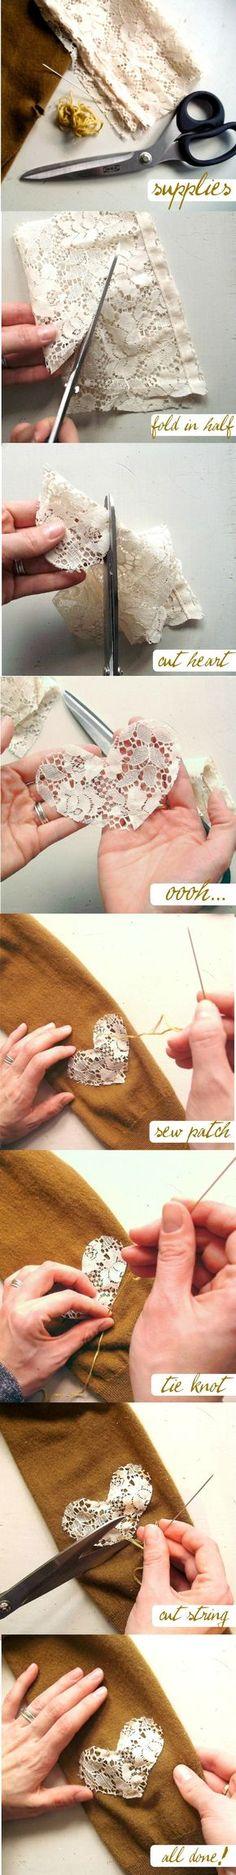 Coudieres dentelles